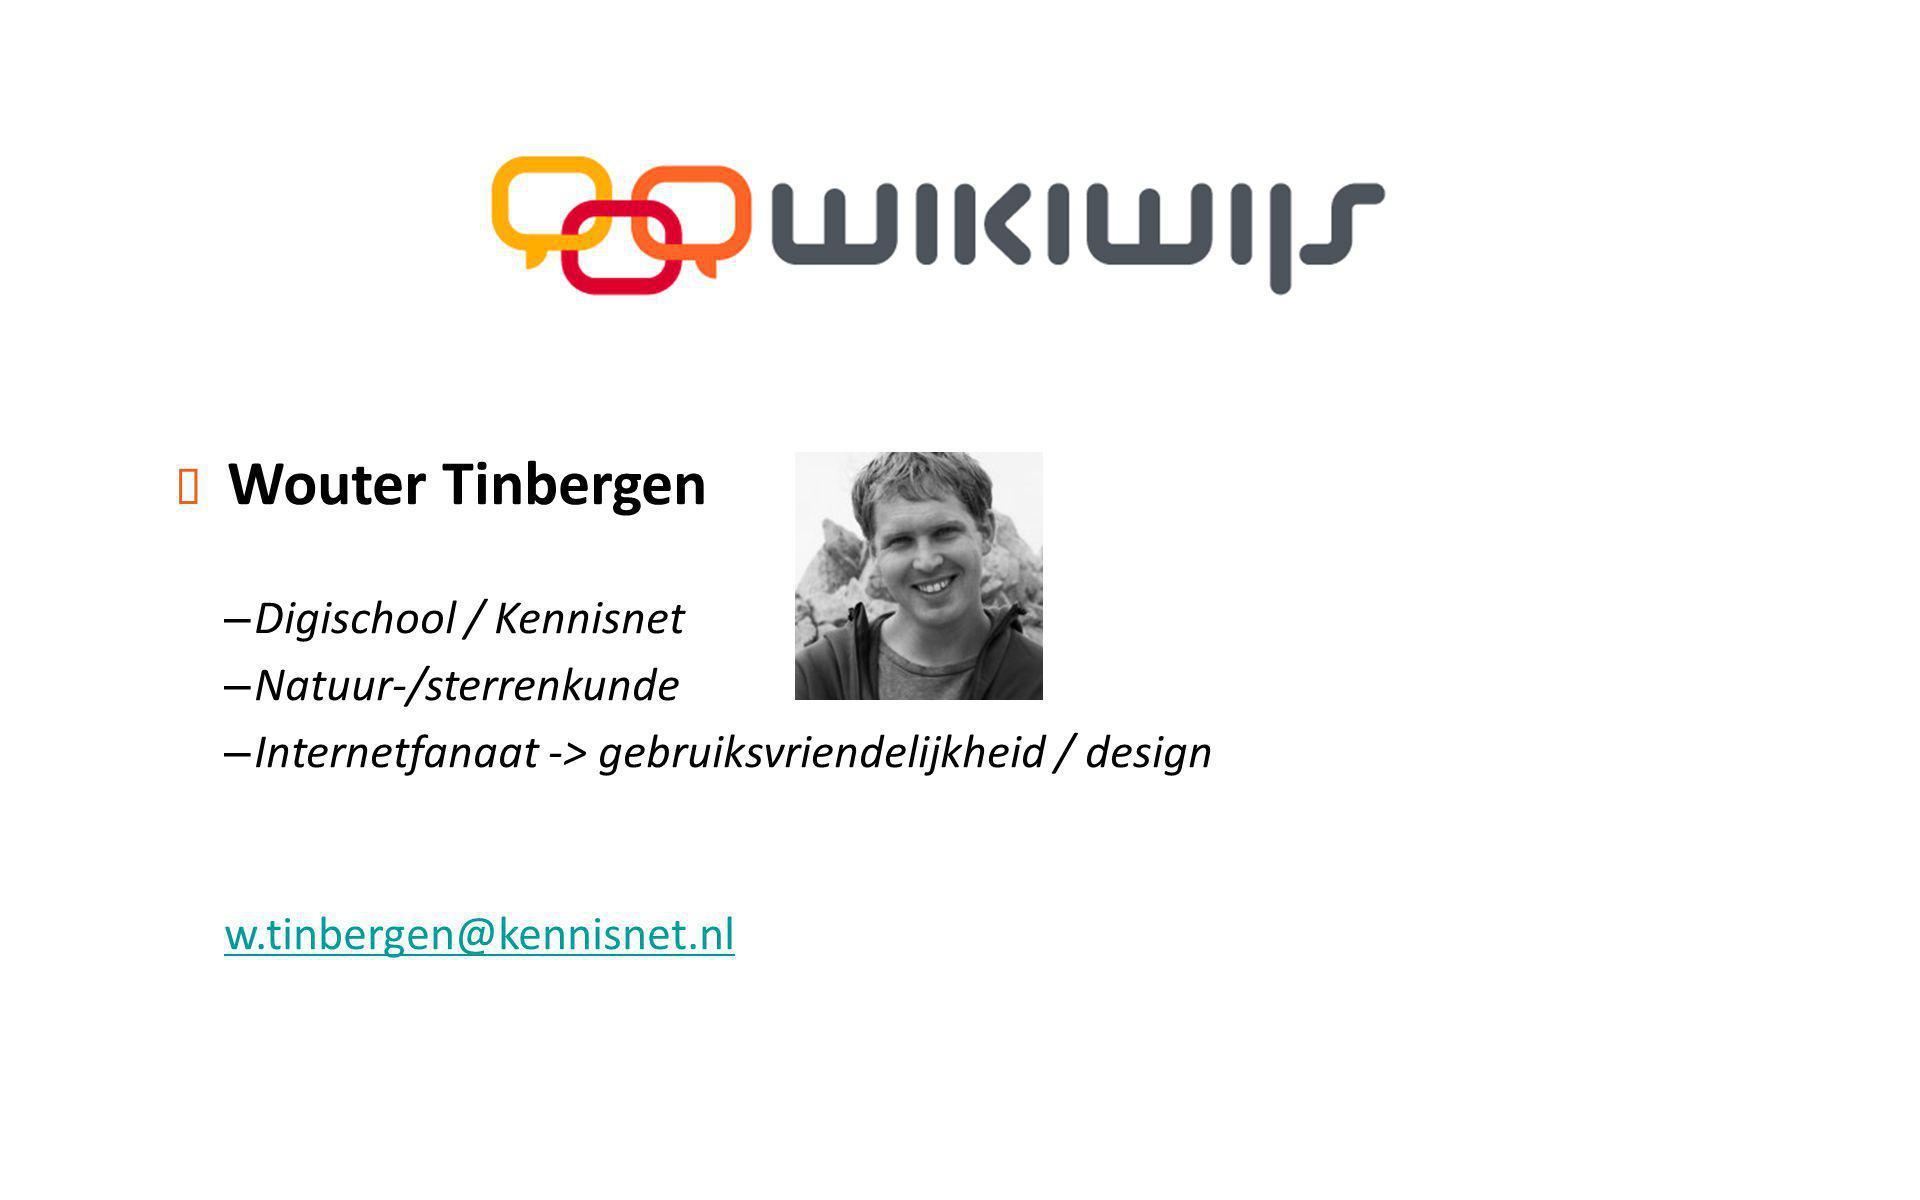 ✦ Wouter Tinbergen – Digischool / Kennisnet – Natuur-/sterrenkunde – Internetfanaat -> gebruiksvriendelijkheid / design w.tinbergen@kennisnet.nl